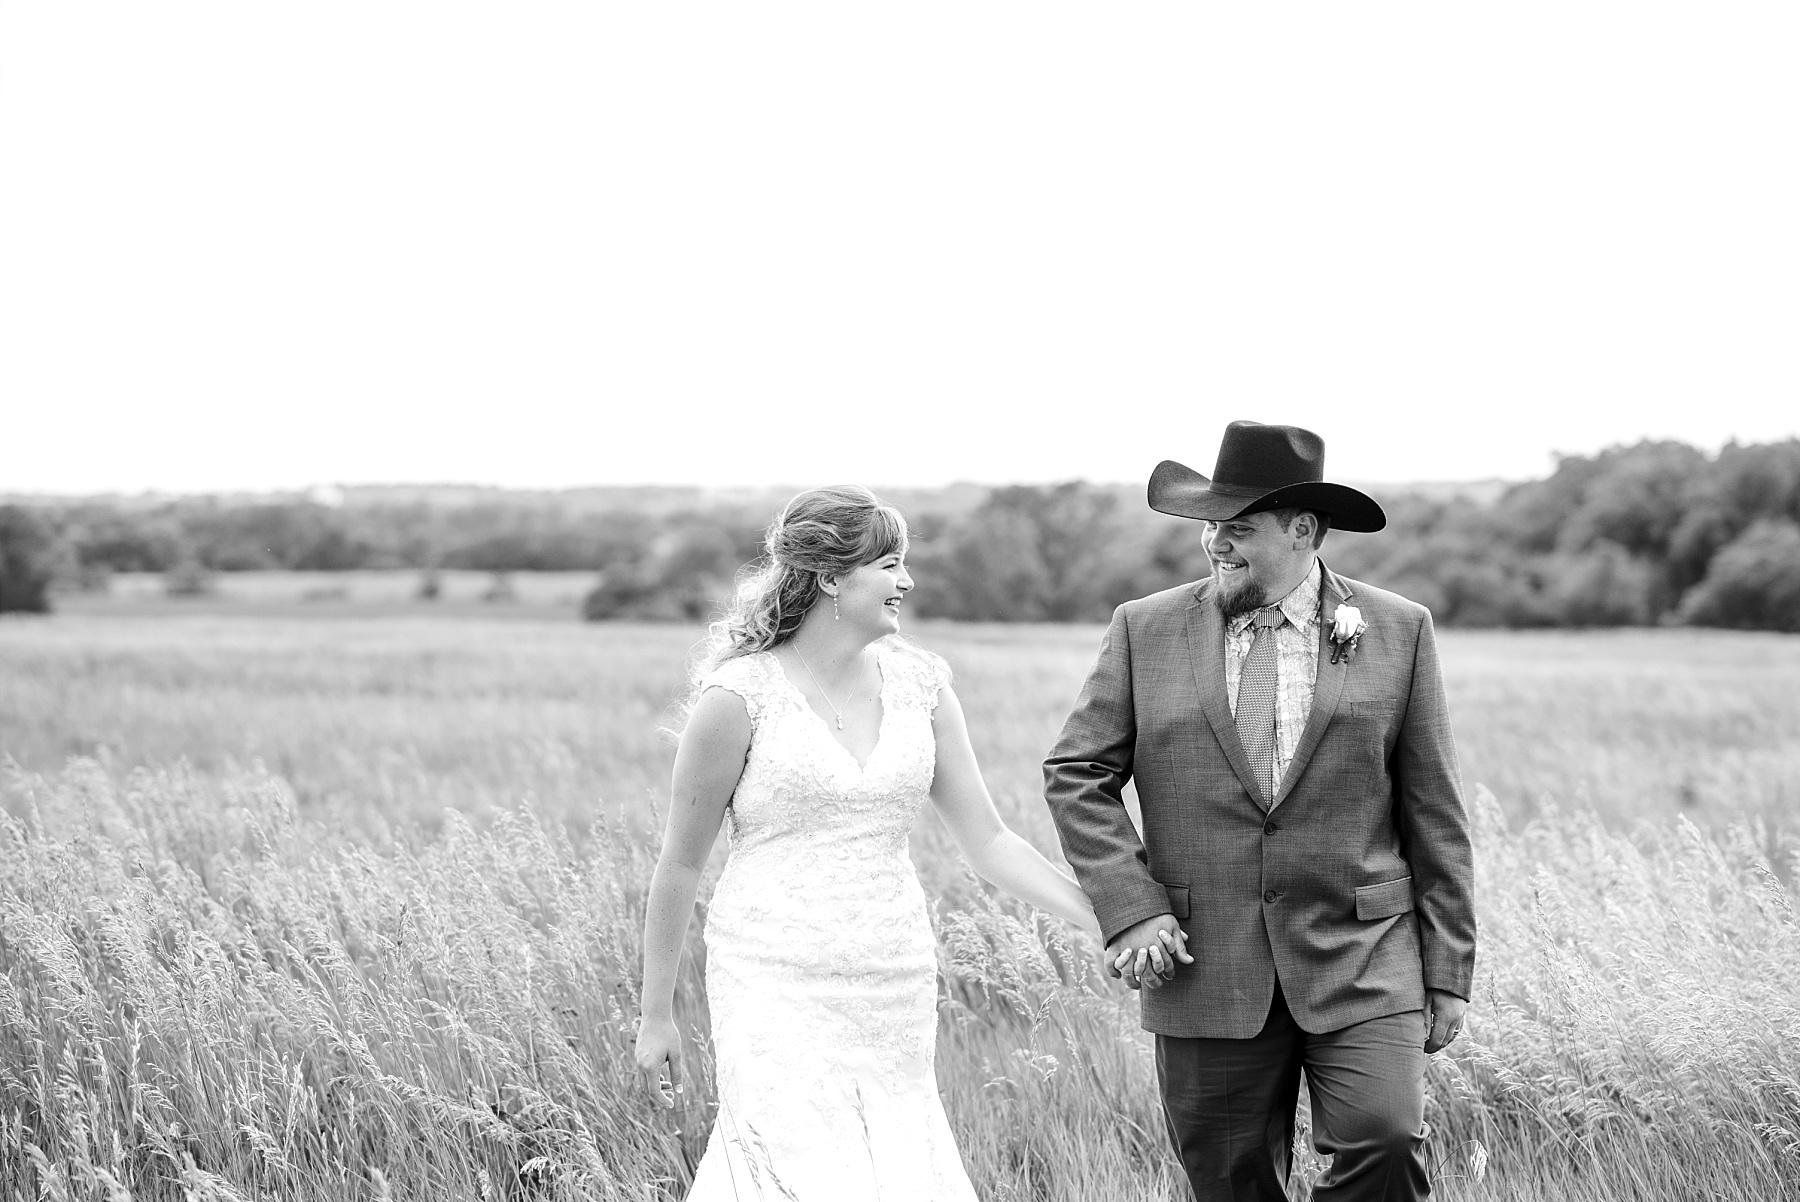 Kansas Plains Bridal Portrait by Kelsi Kliethermes Photography